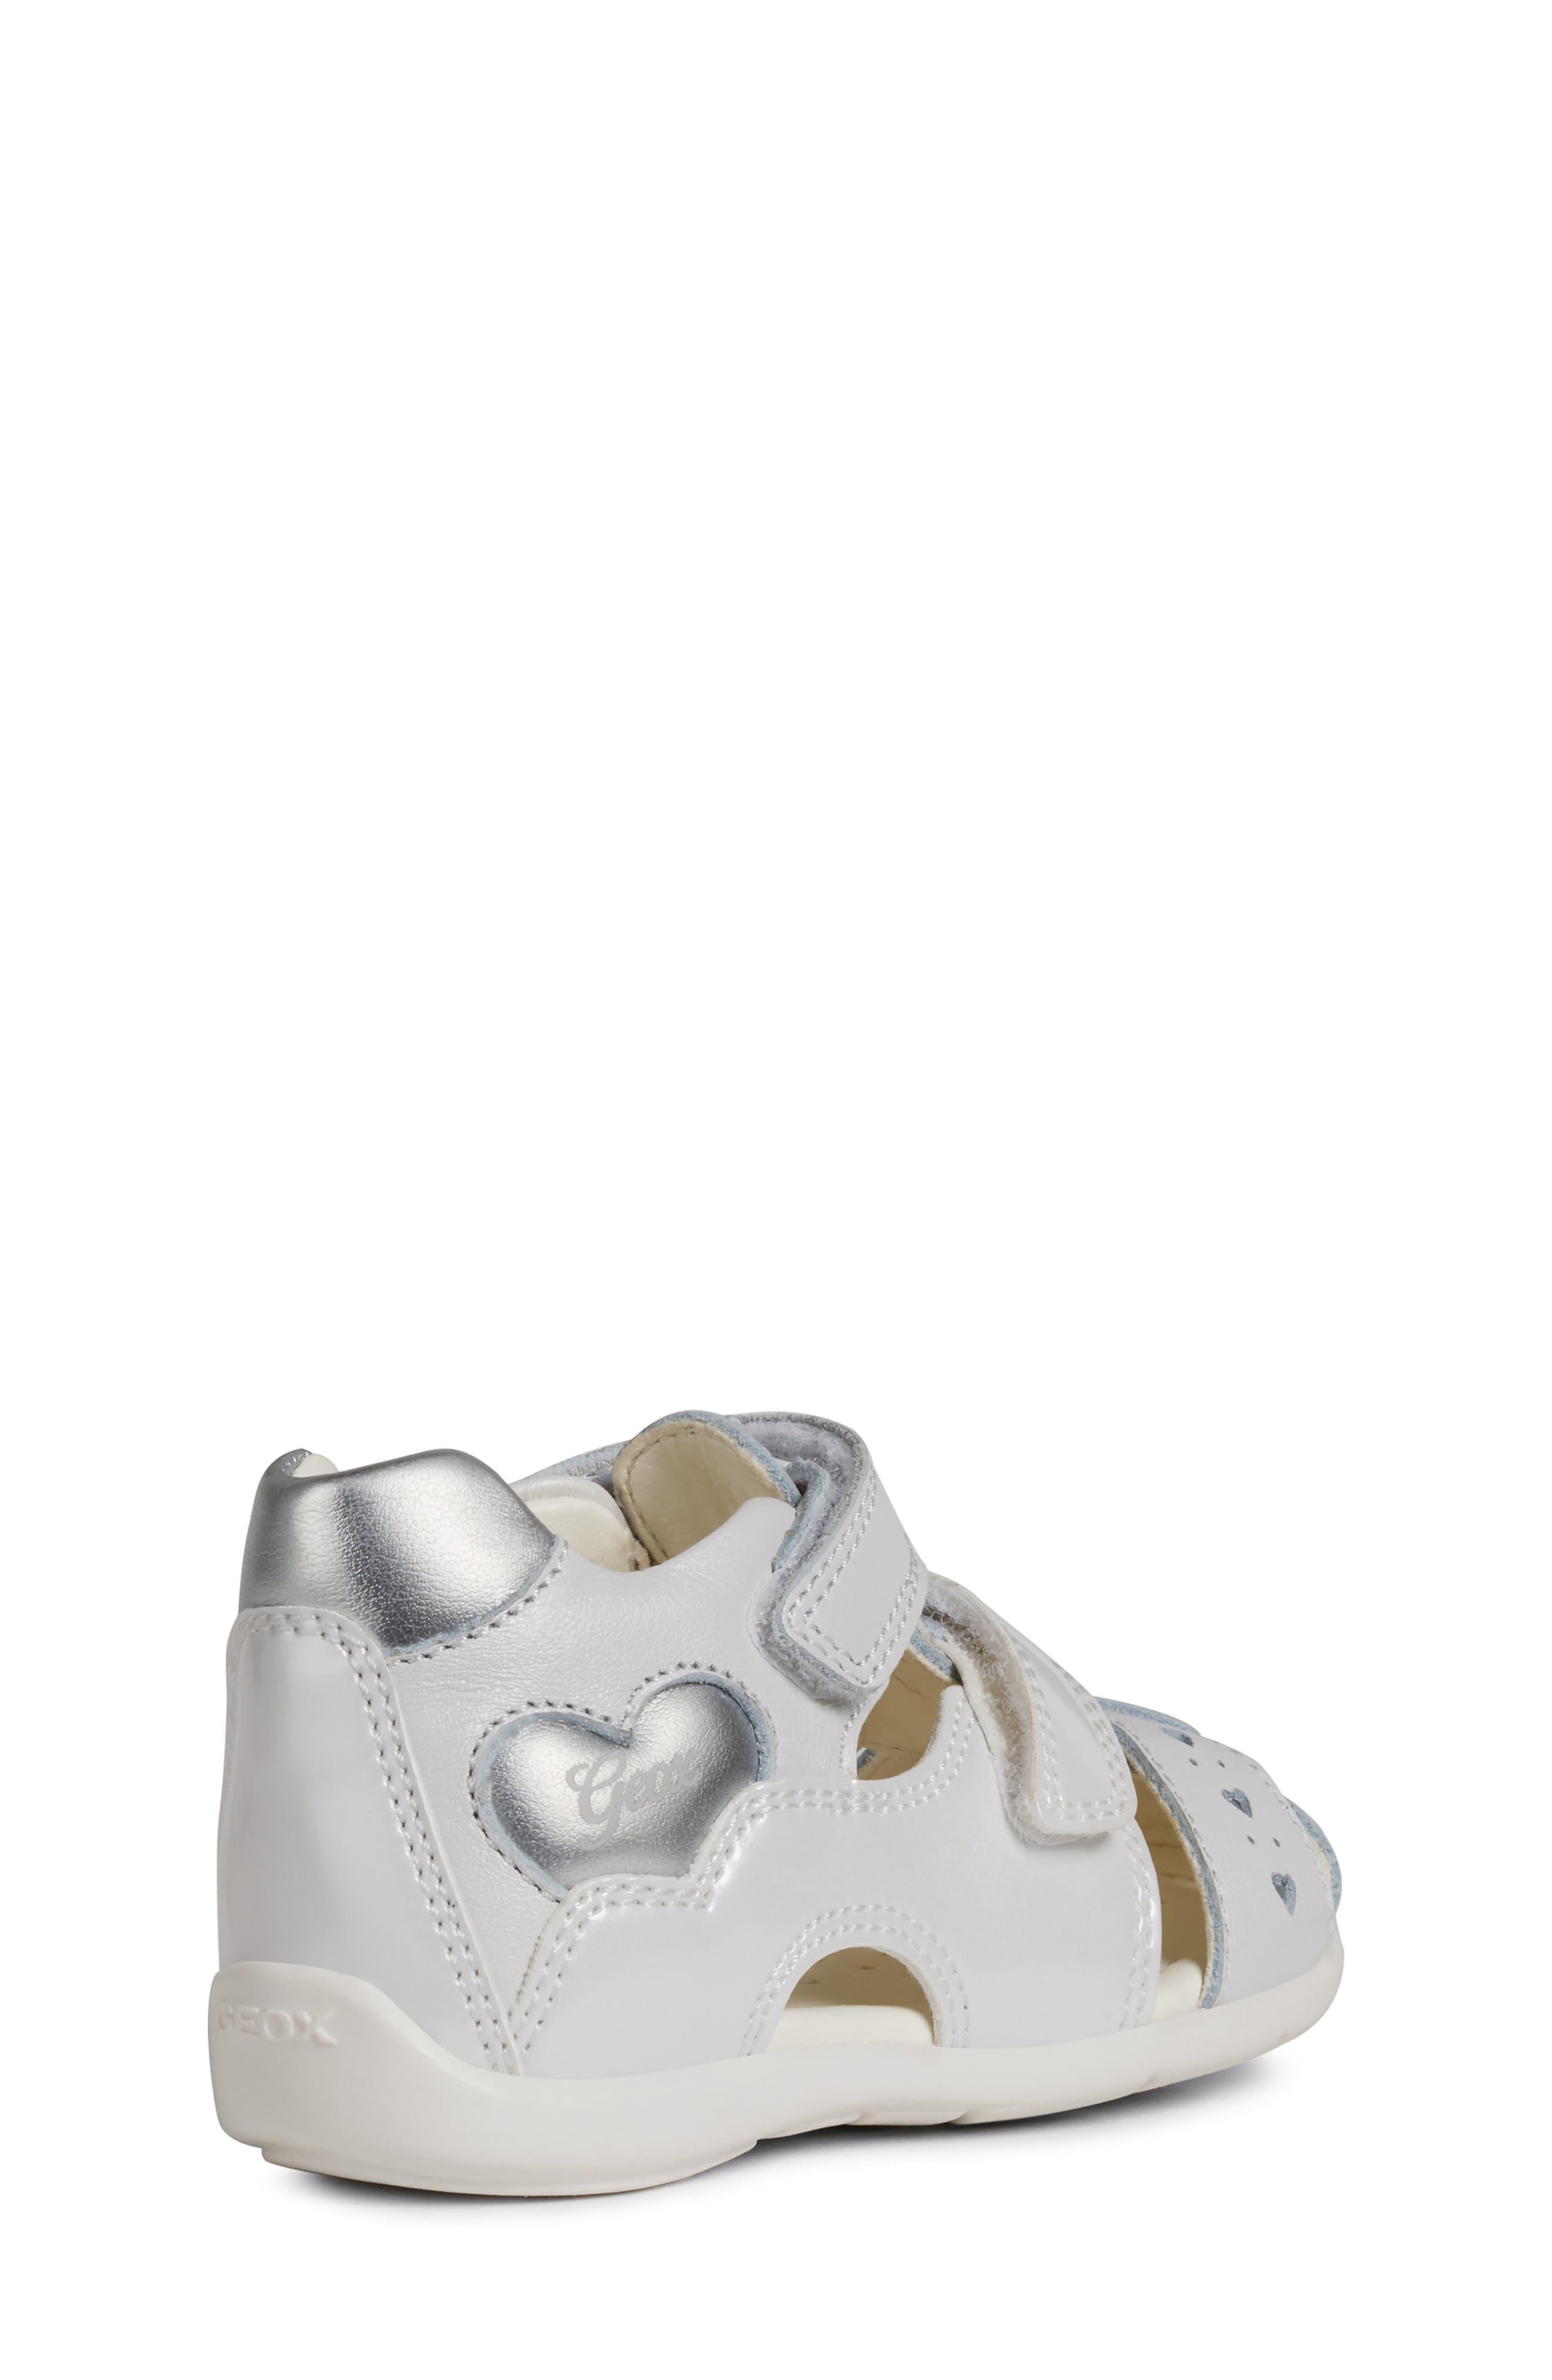 GEOX,                             Kaytan 52 Shimmery Sandal,                             Alternate thumbnail 7, color,                             WHITE/ SILVER